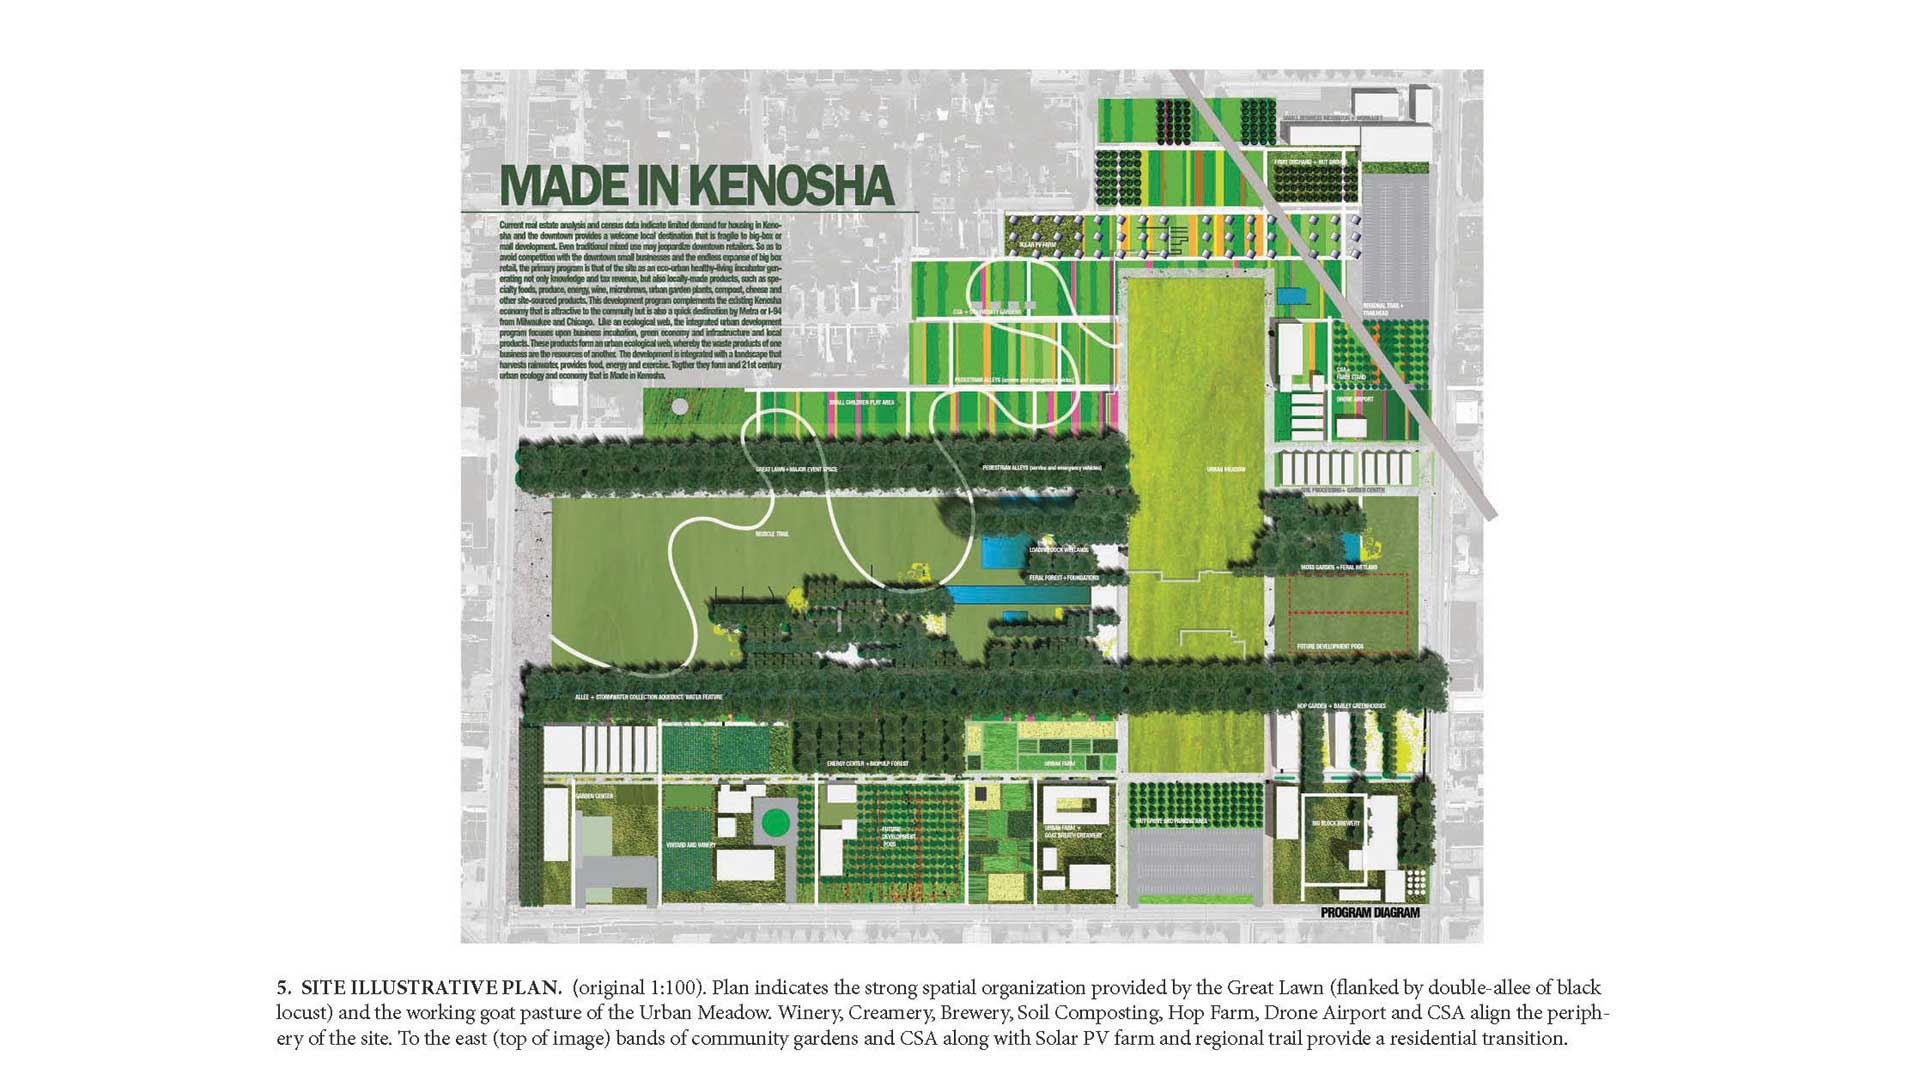 2016_MADE-IN-KENOSHA_6.jpg